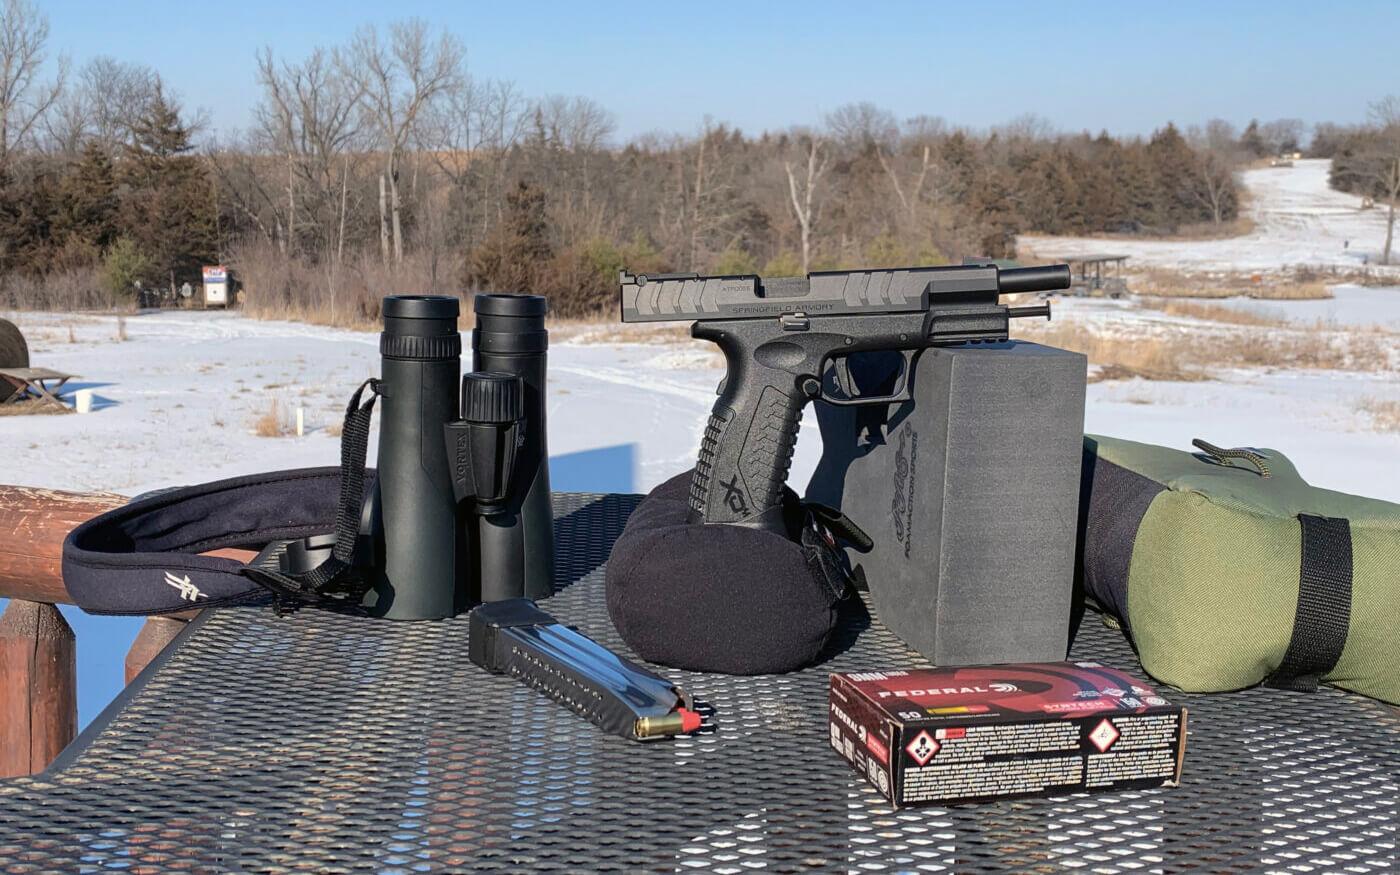 Long distance shooting gear